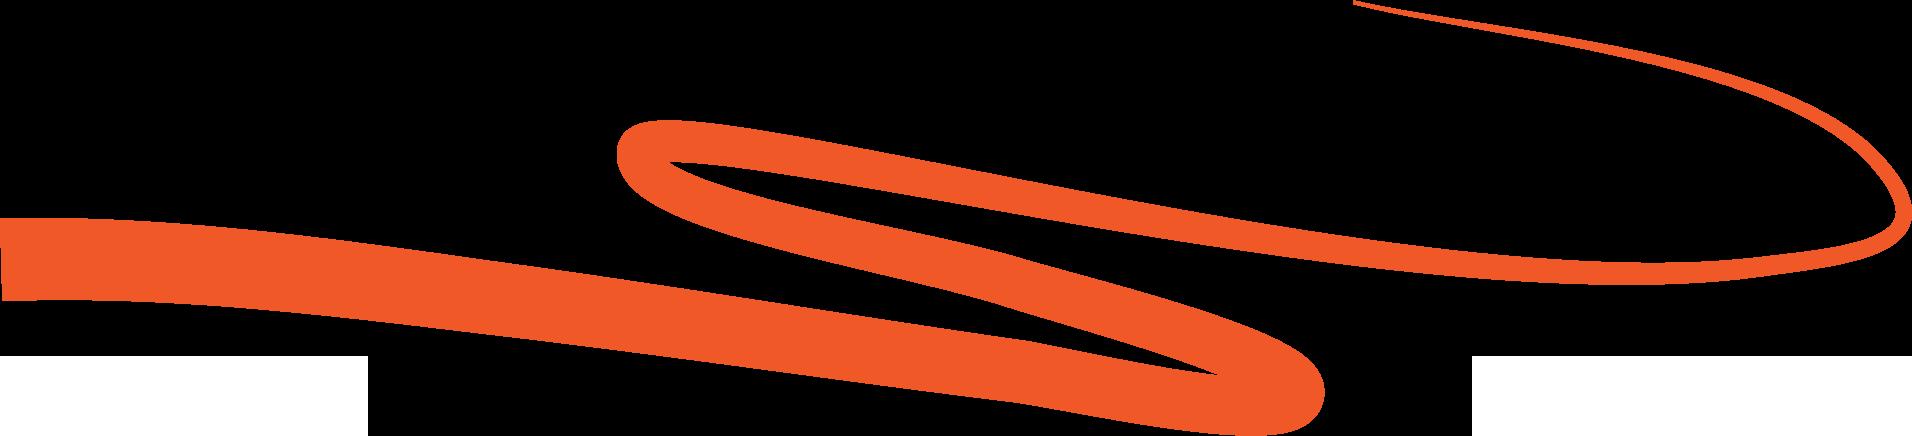 orange swash line decoration